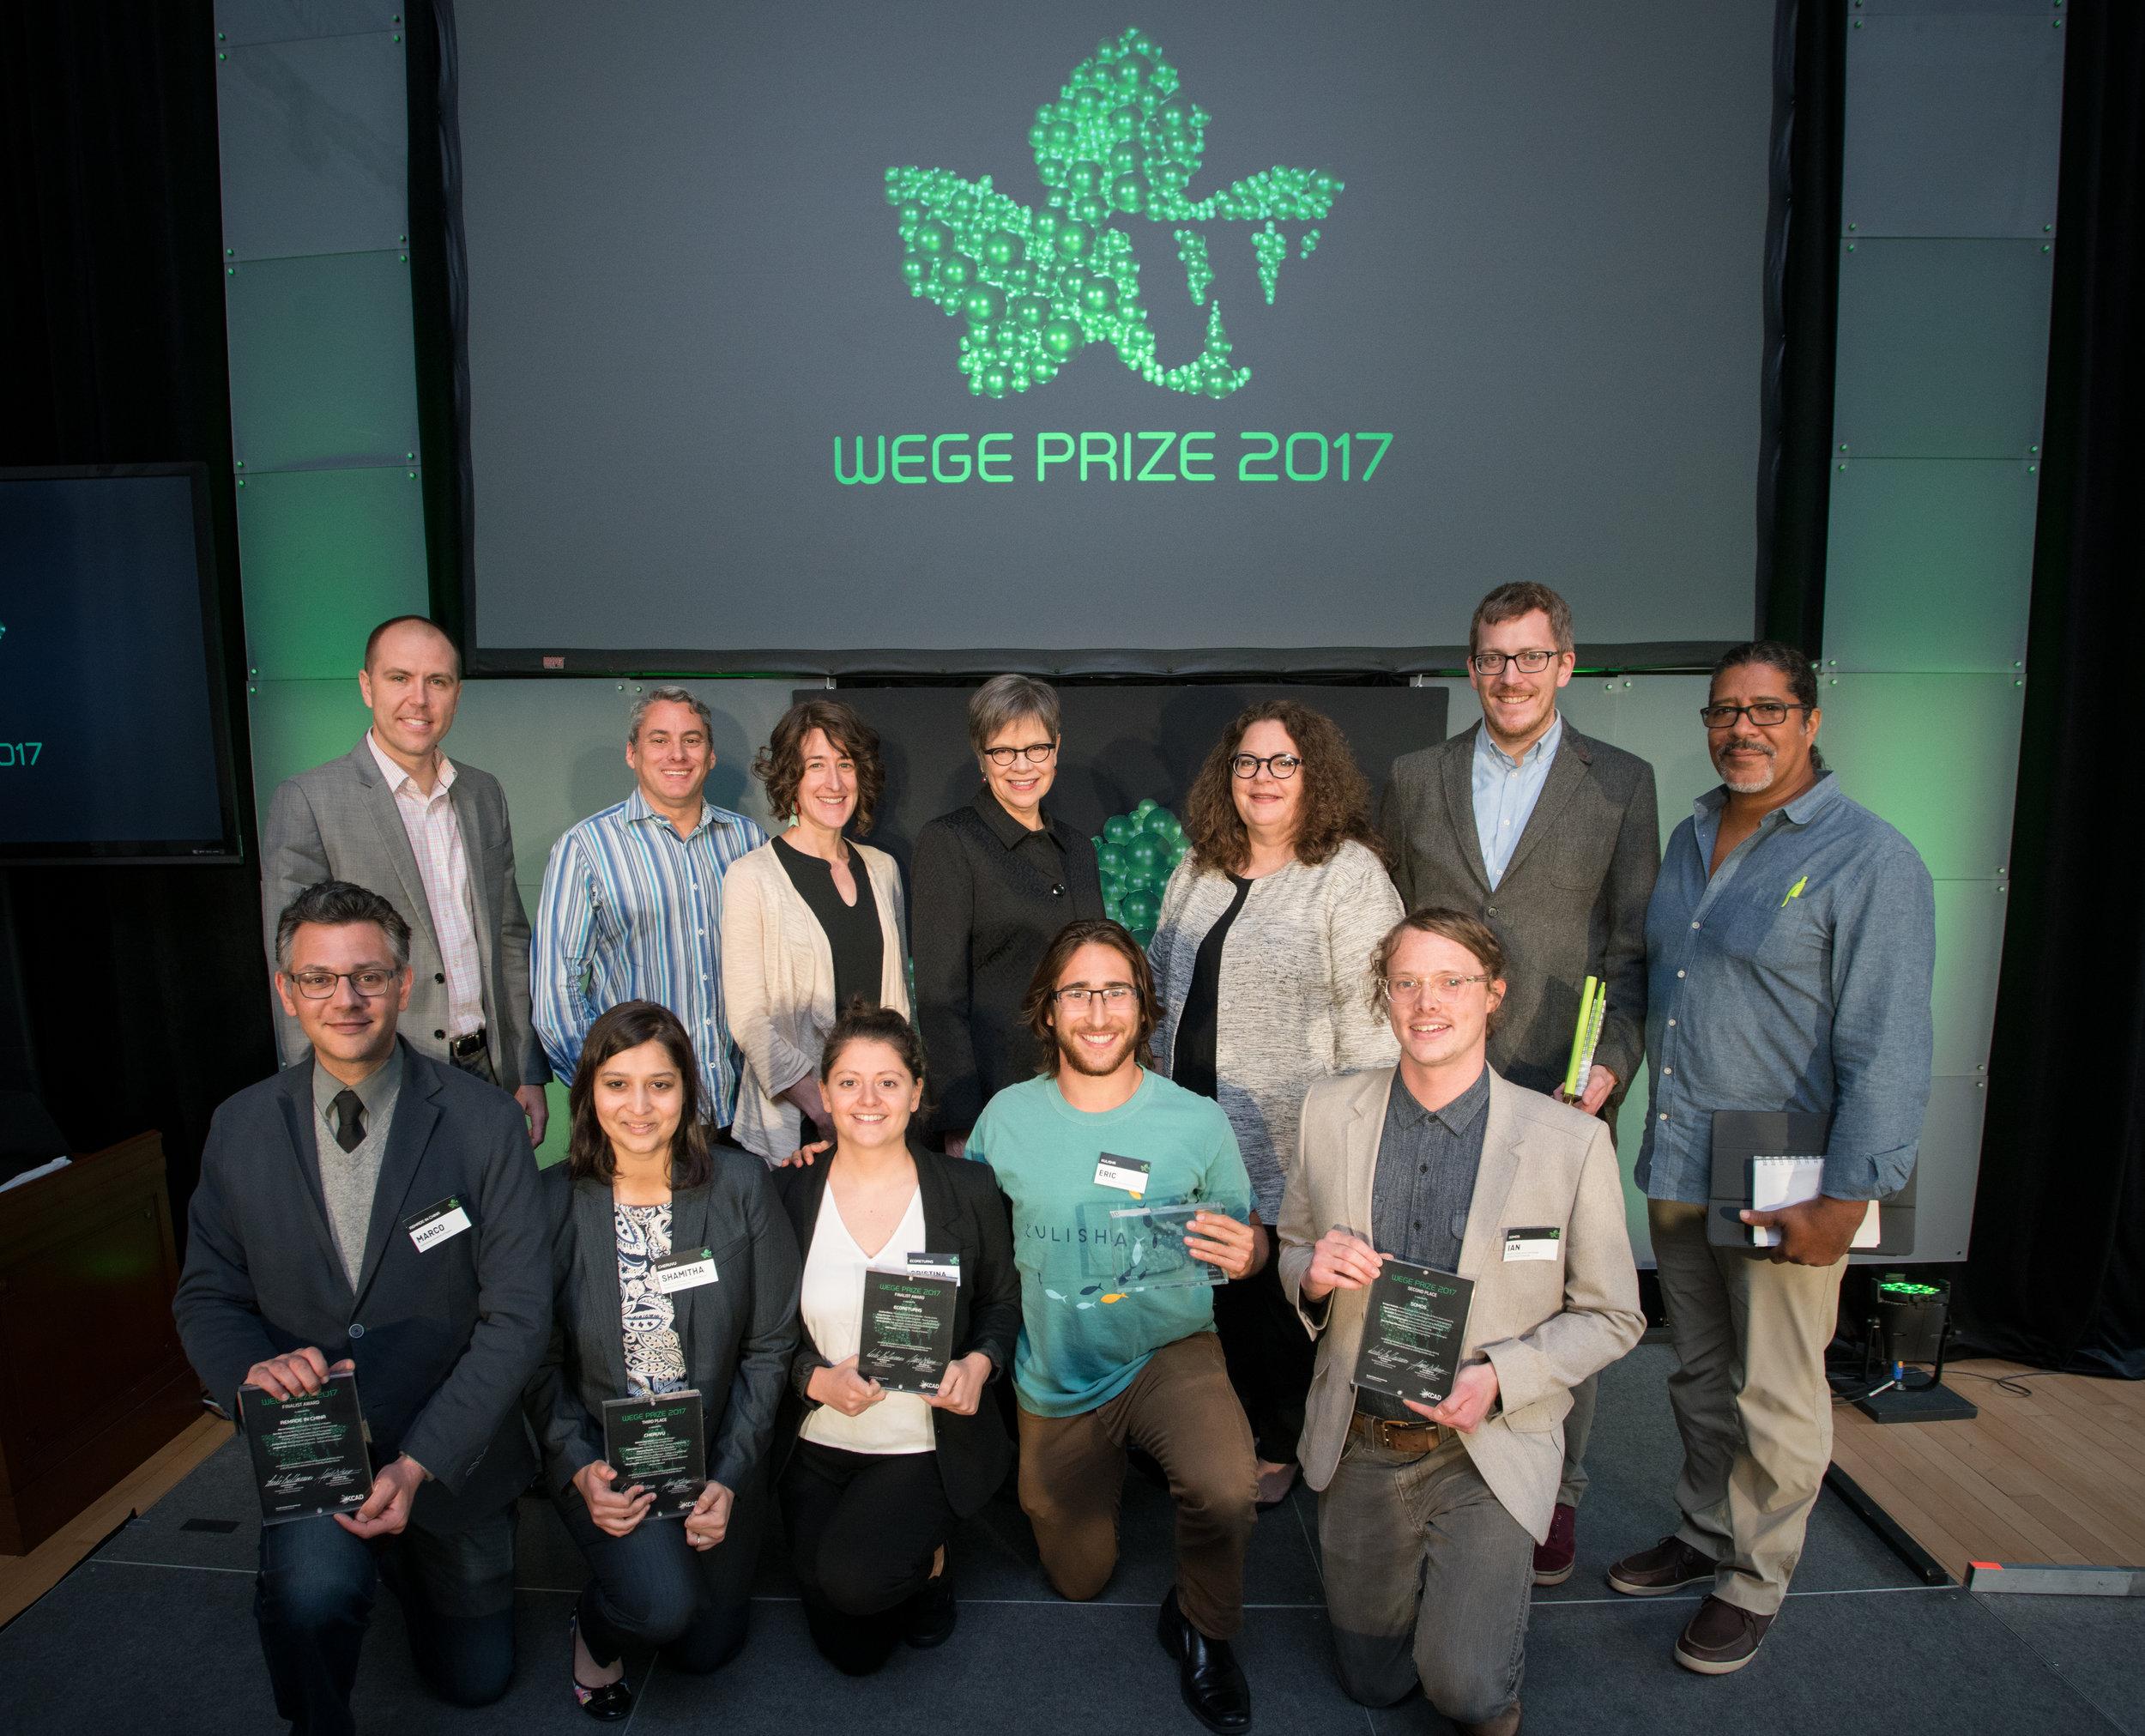 Wege Prize 2017 winners and judges